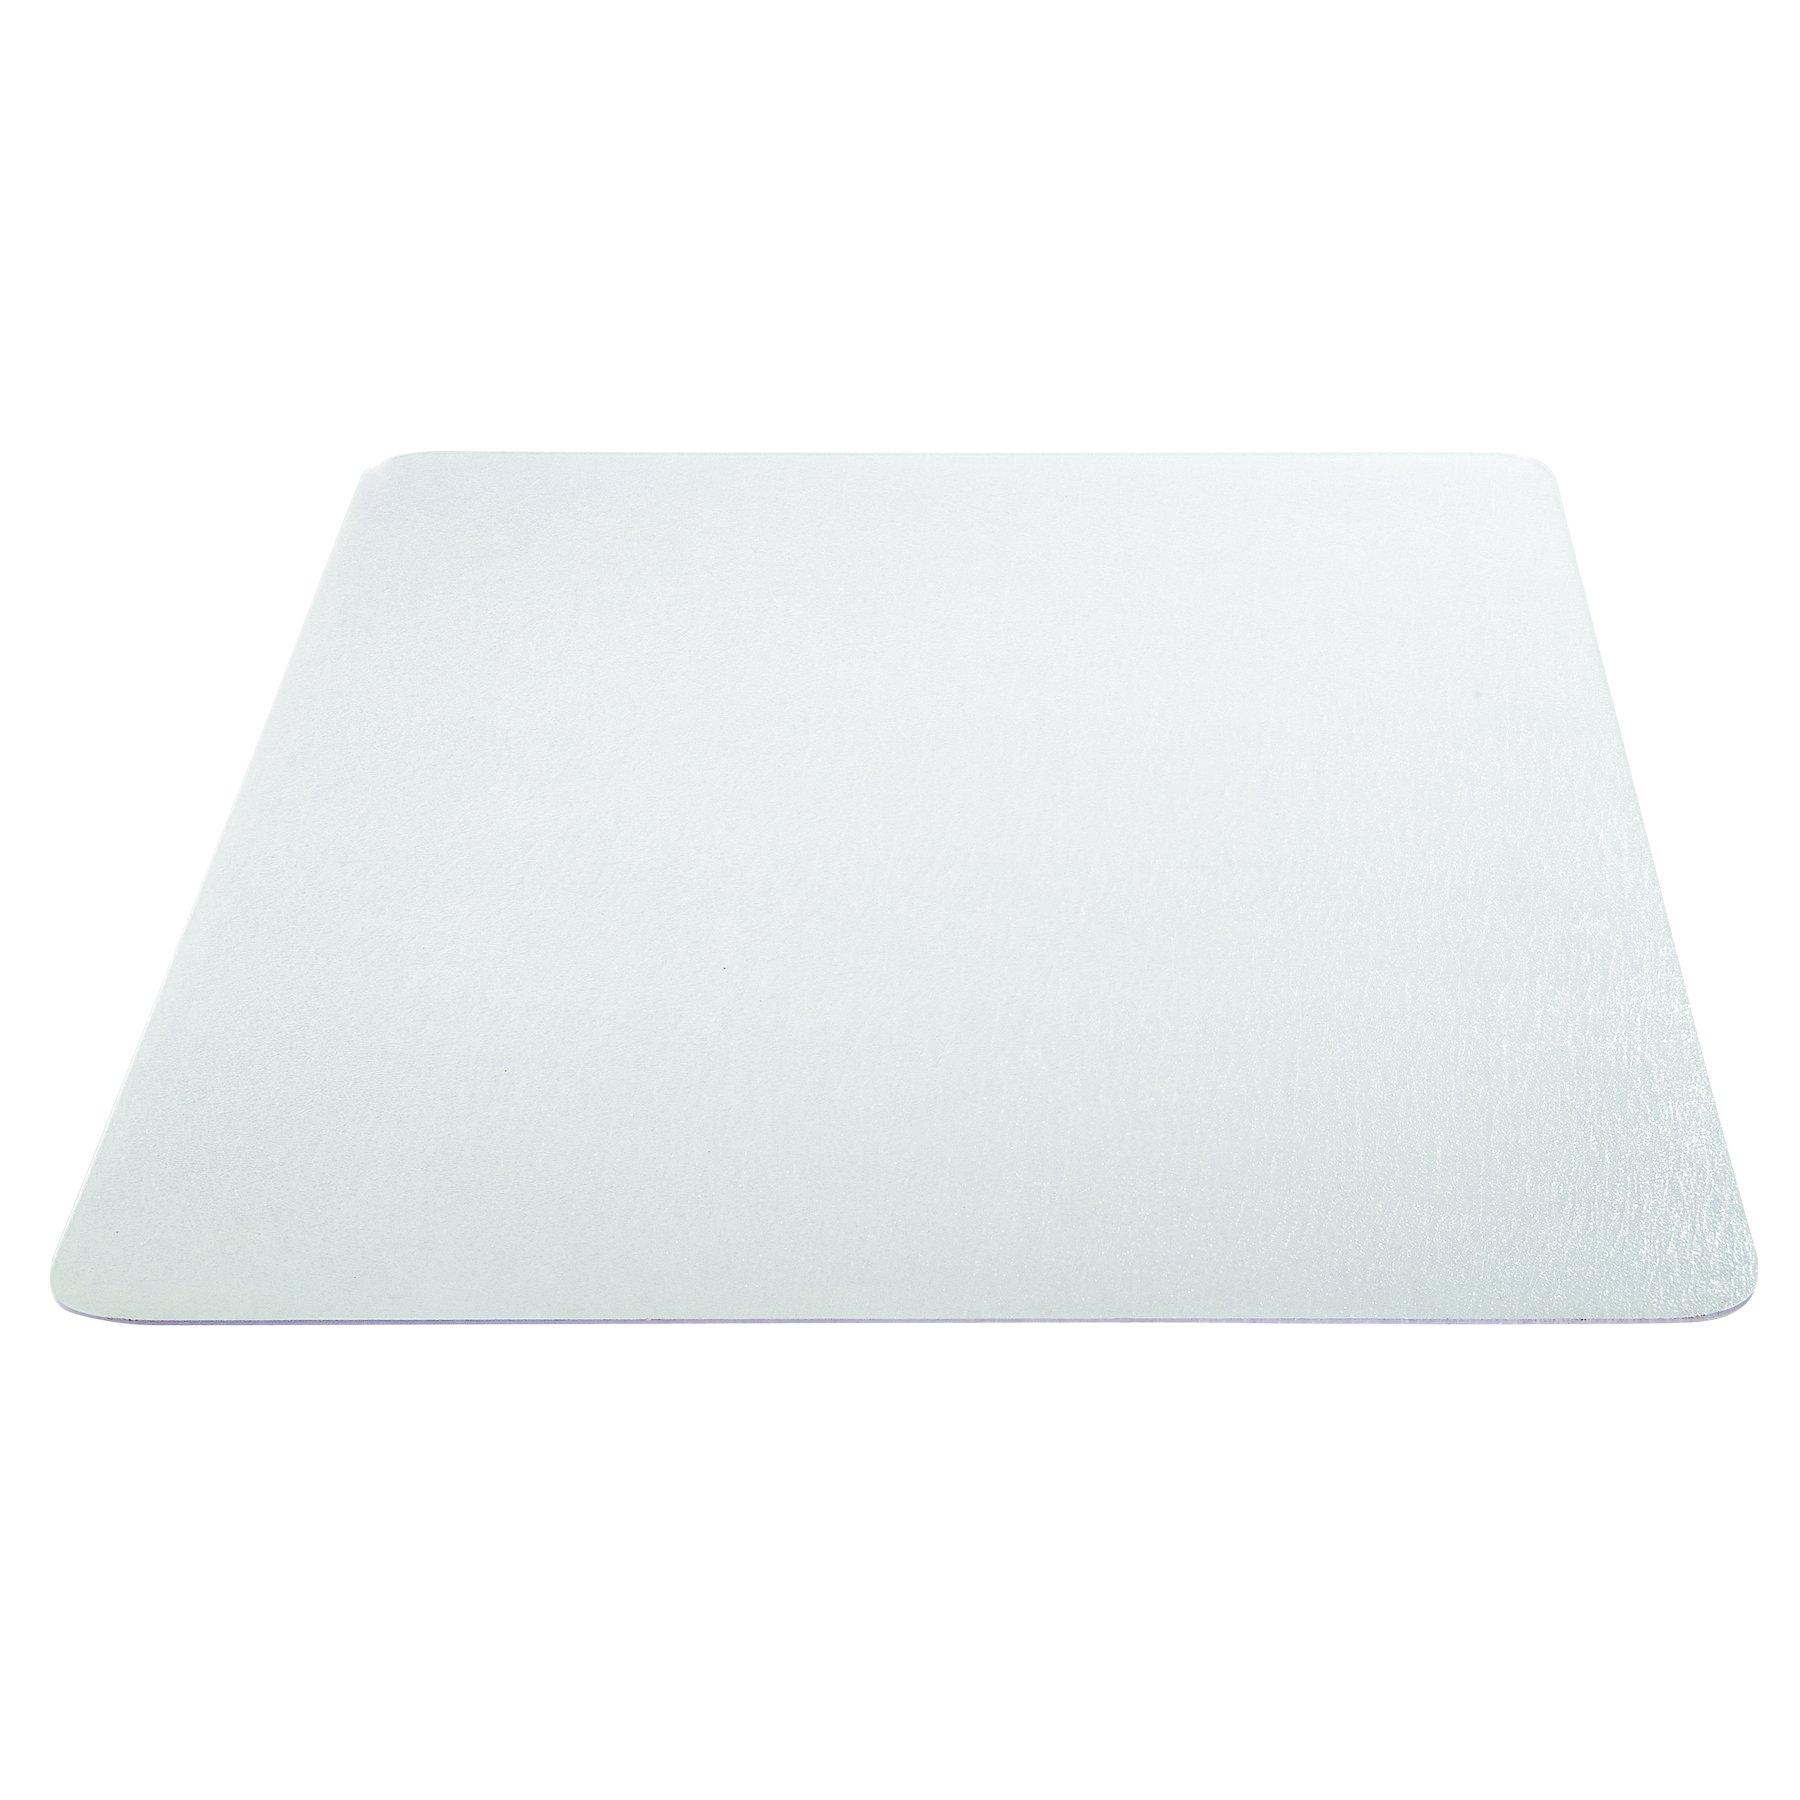 Deflecto Clear Chair Mat, Carpet and Hard Floor Use, Straight Edge, 46'' x 60'', Clear (CM23442FDUOCOM)